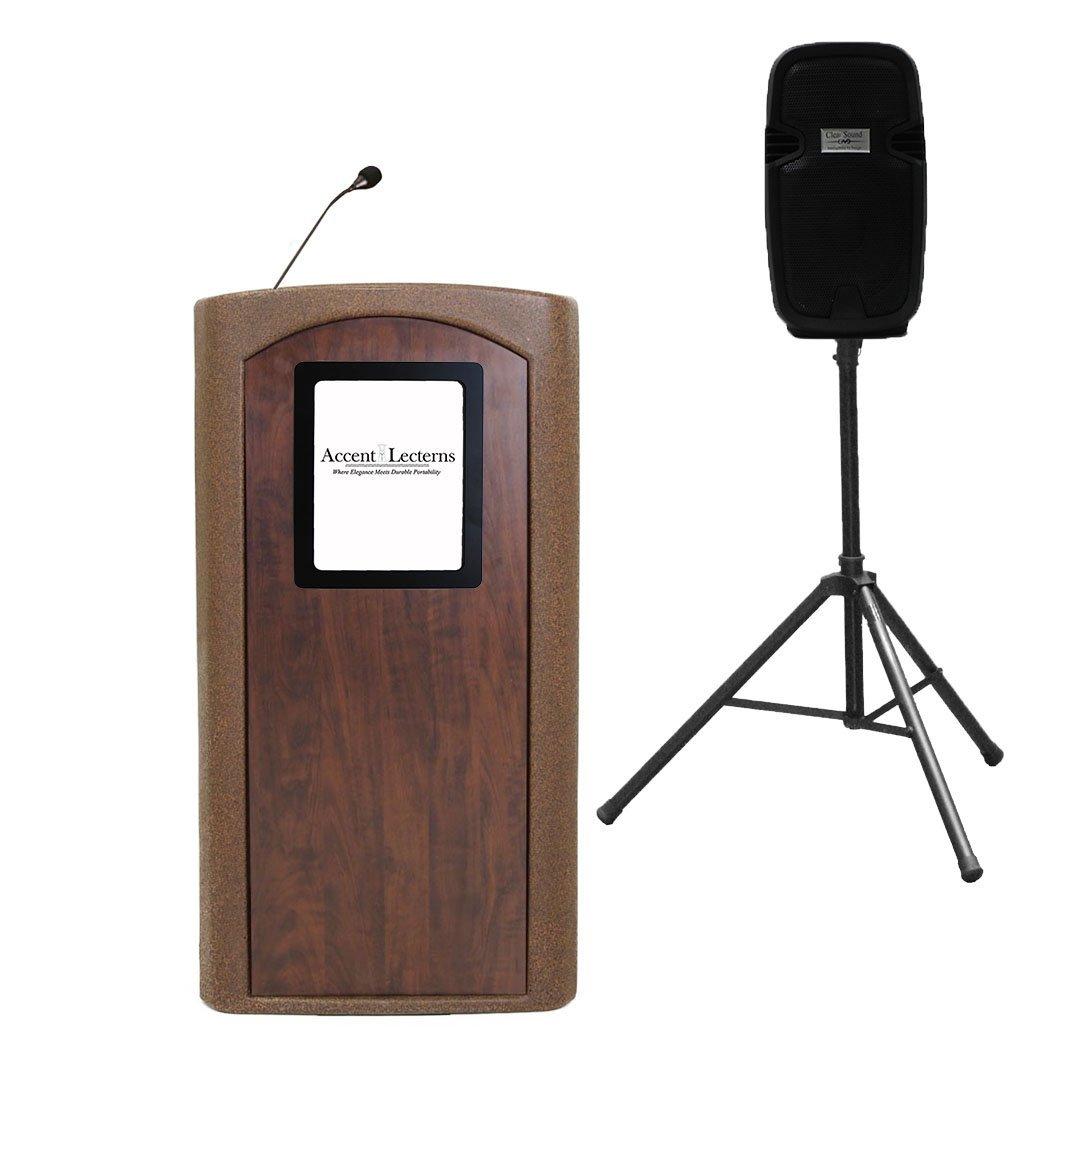 NEW! Accent Classic Presenter Vertical Logo Podium Lectern External Speaker, Bronze Granite - Dan James Original